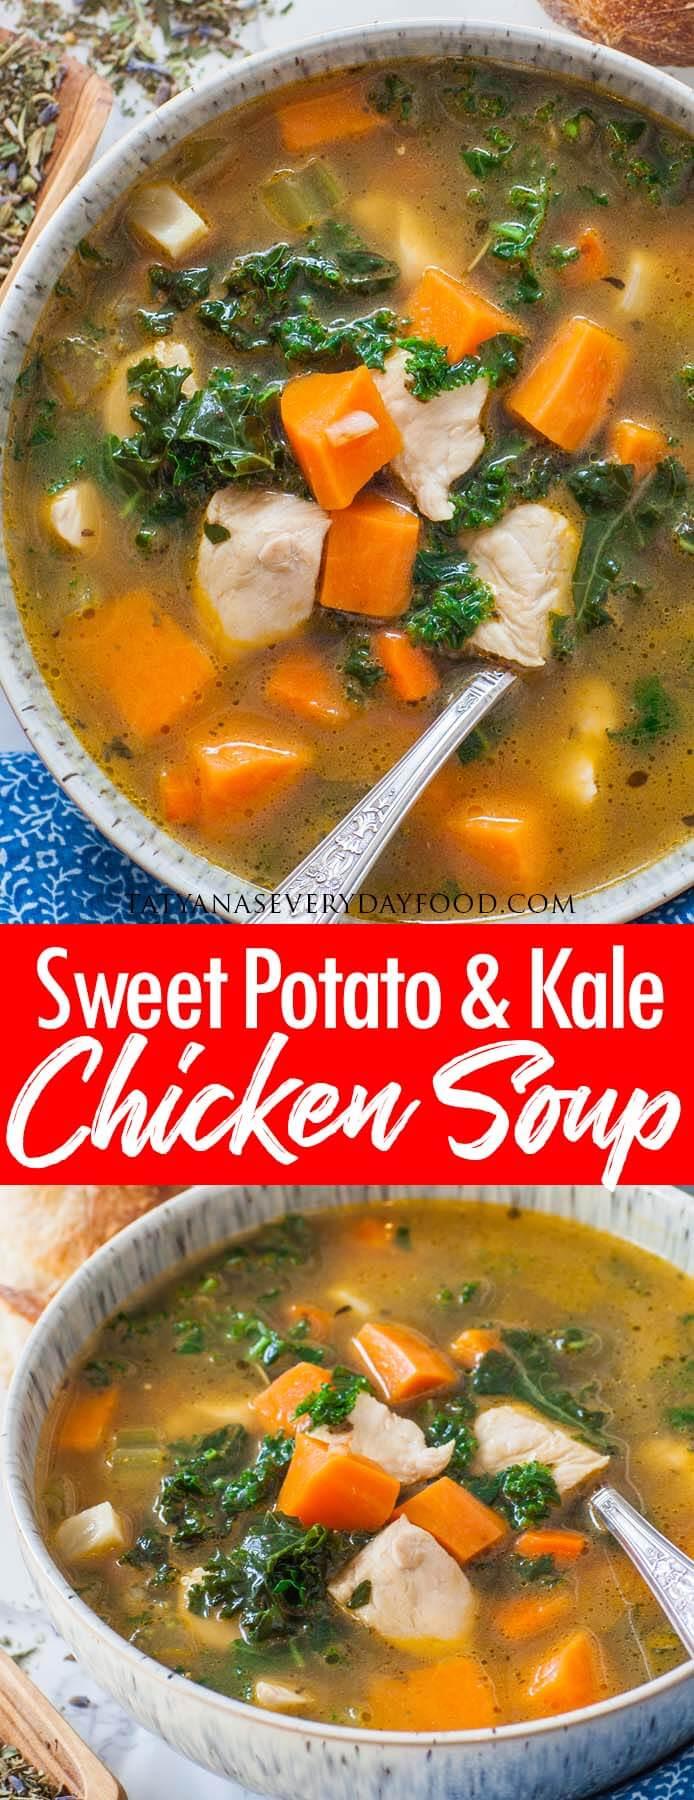 Sweet Potato Kale Chicken Soup video recipe